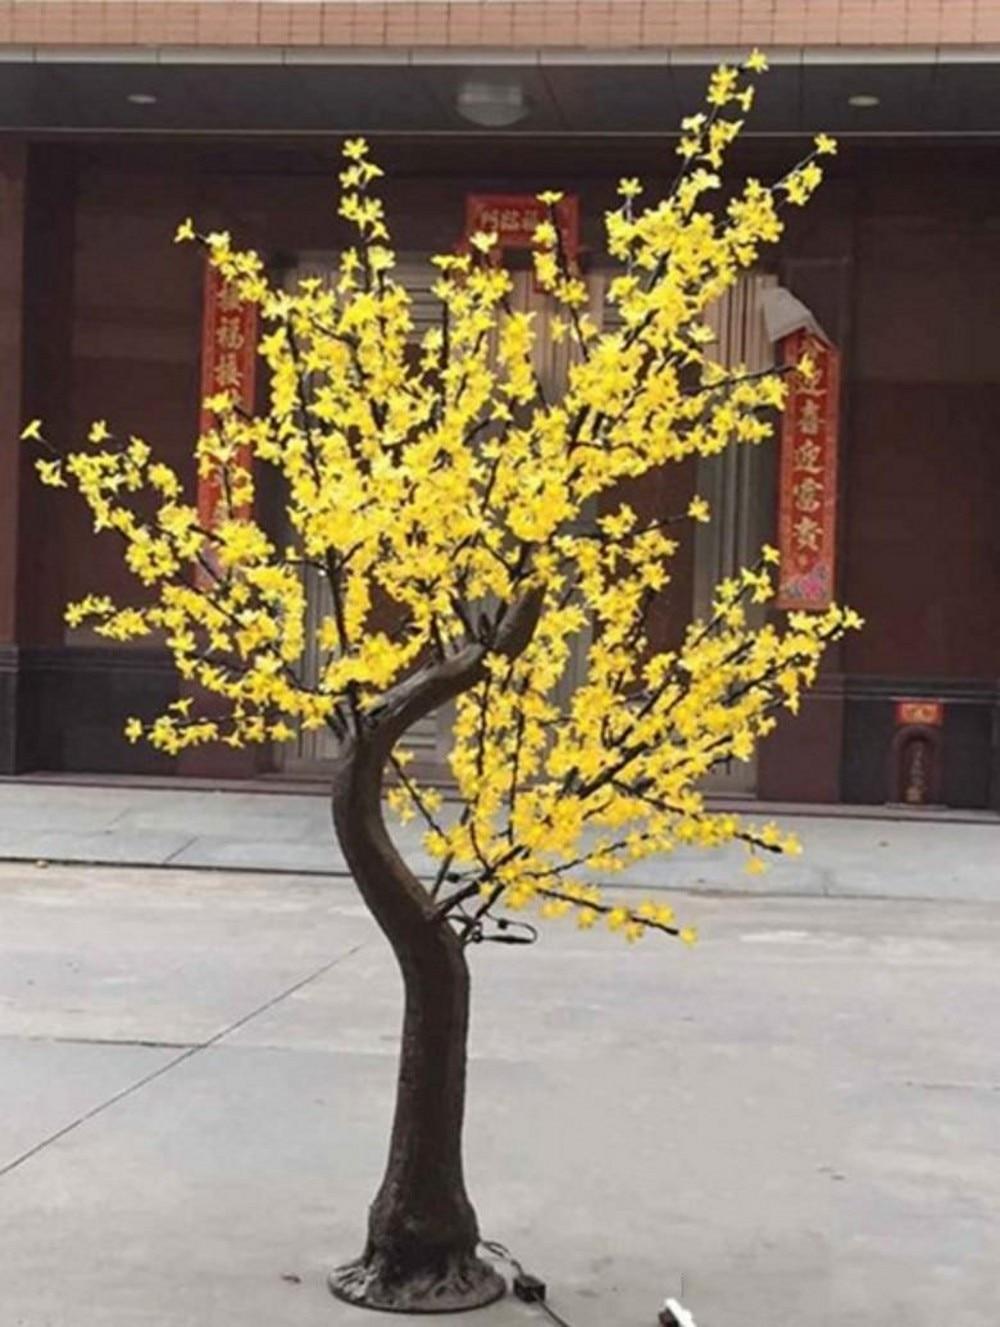 Luz LED para tronco de árbol Natural, flor de cerezo Artificial, luz de Navidad de 1,5 m ~ 2,5 m, altura de 110/220V, impermeable para uso en exteriores